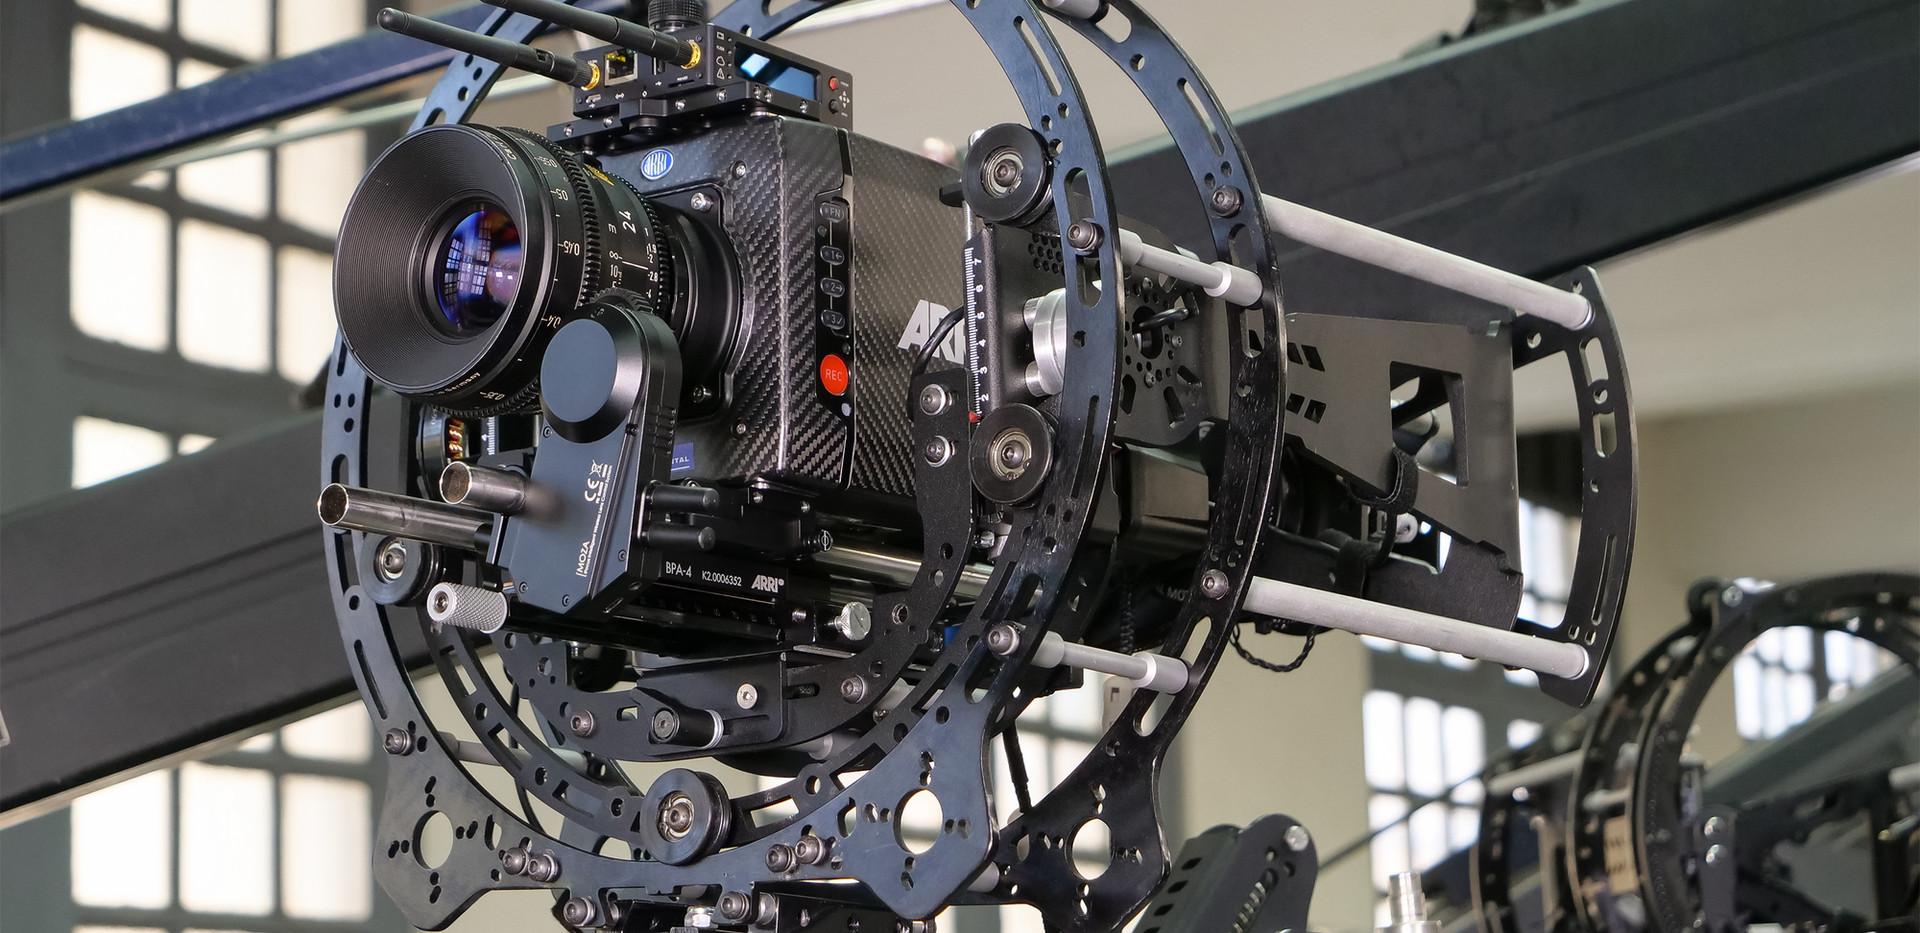 carbon fiber Arri alexa mini on the hybrid steadycam Endless 3 Basson Steady camera stabilizer